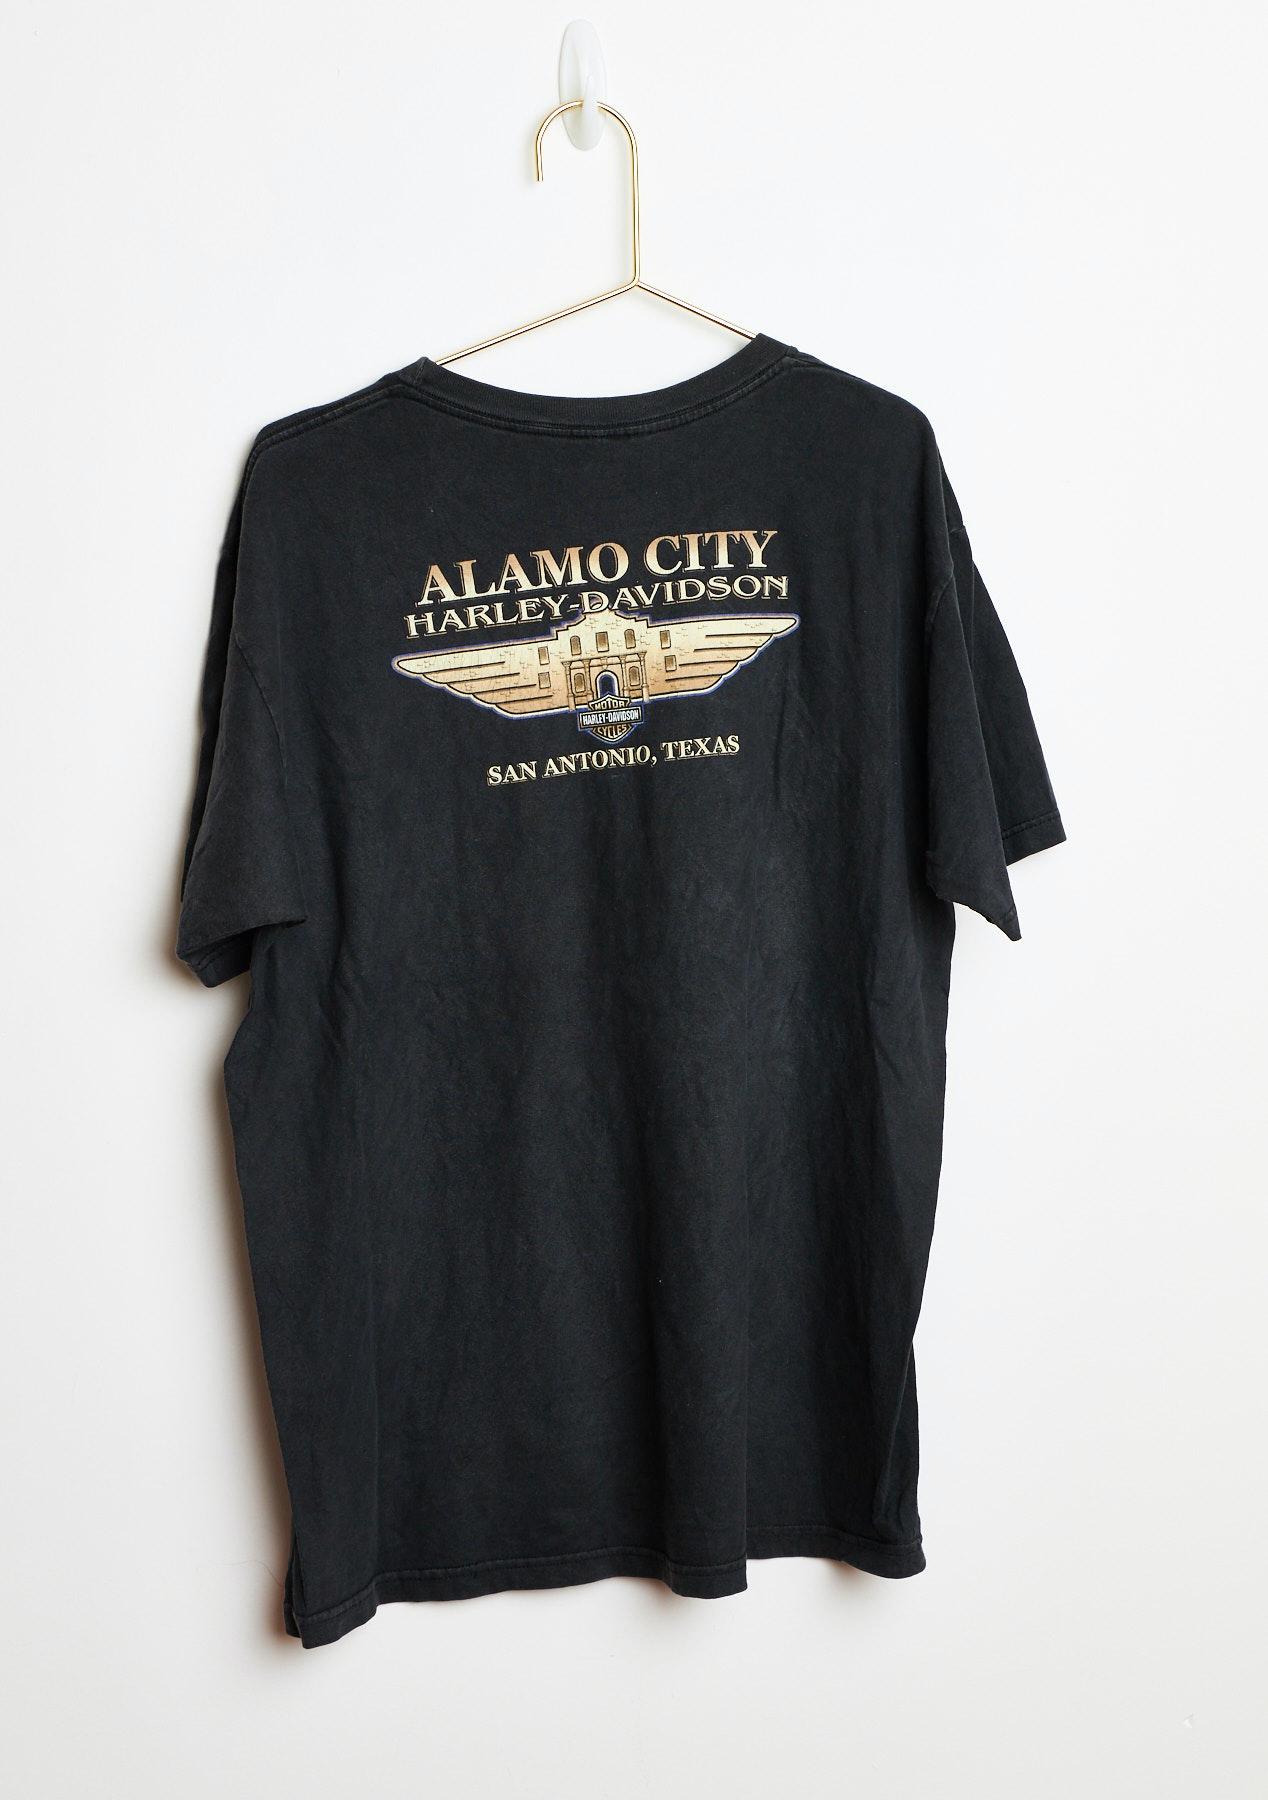 Harley Davidson San Antonio >> Harley Davidson Tees San Antonio Tx Black